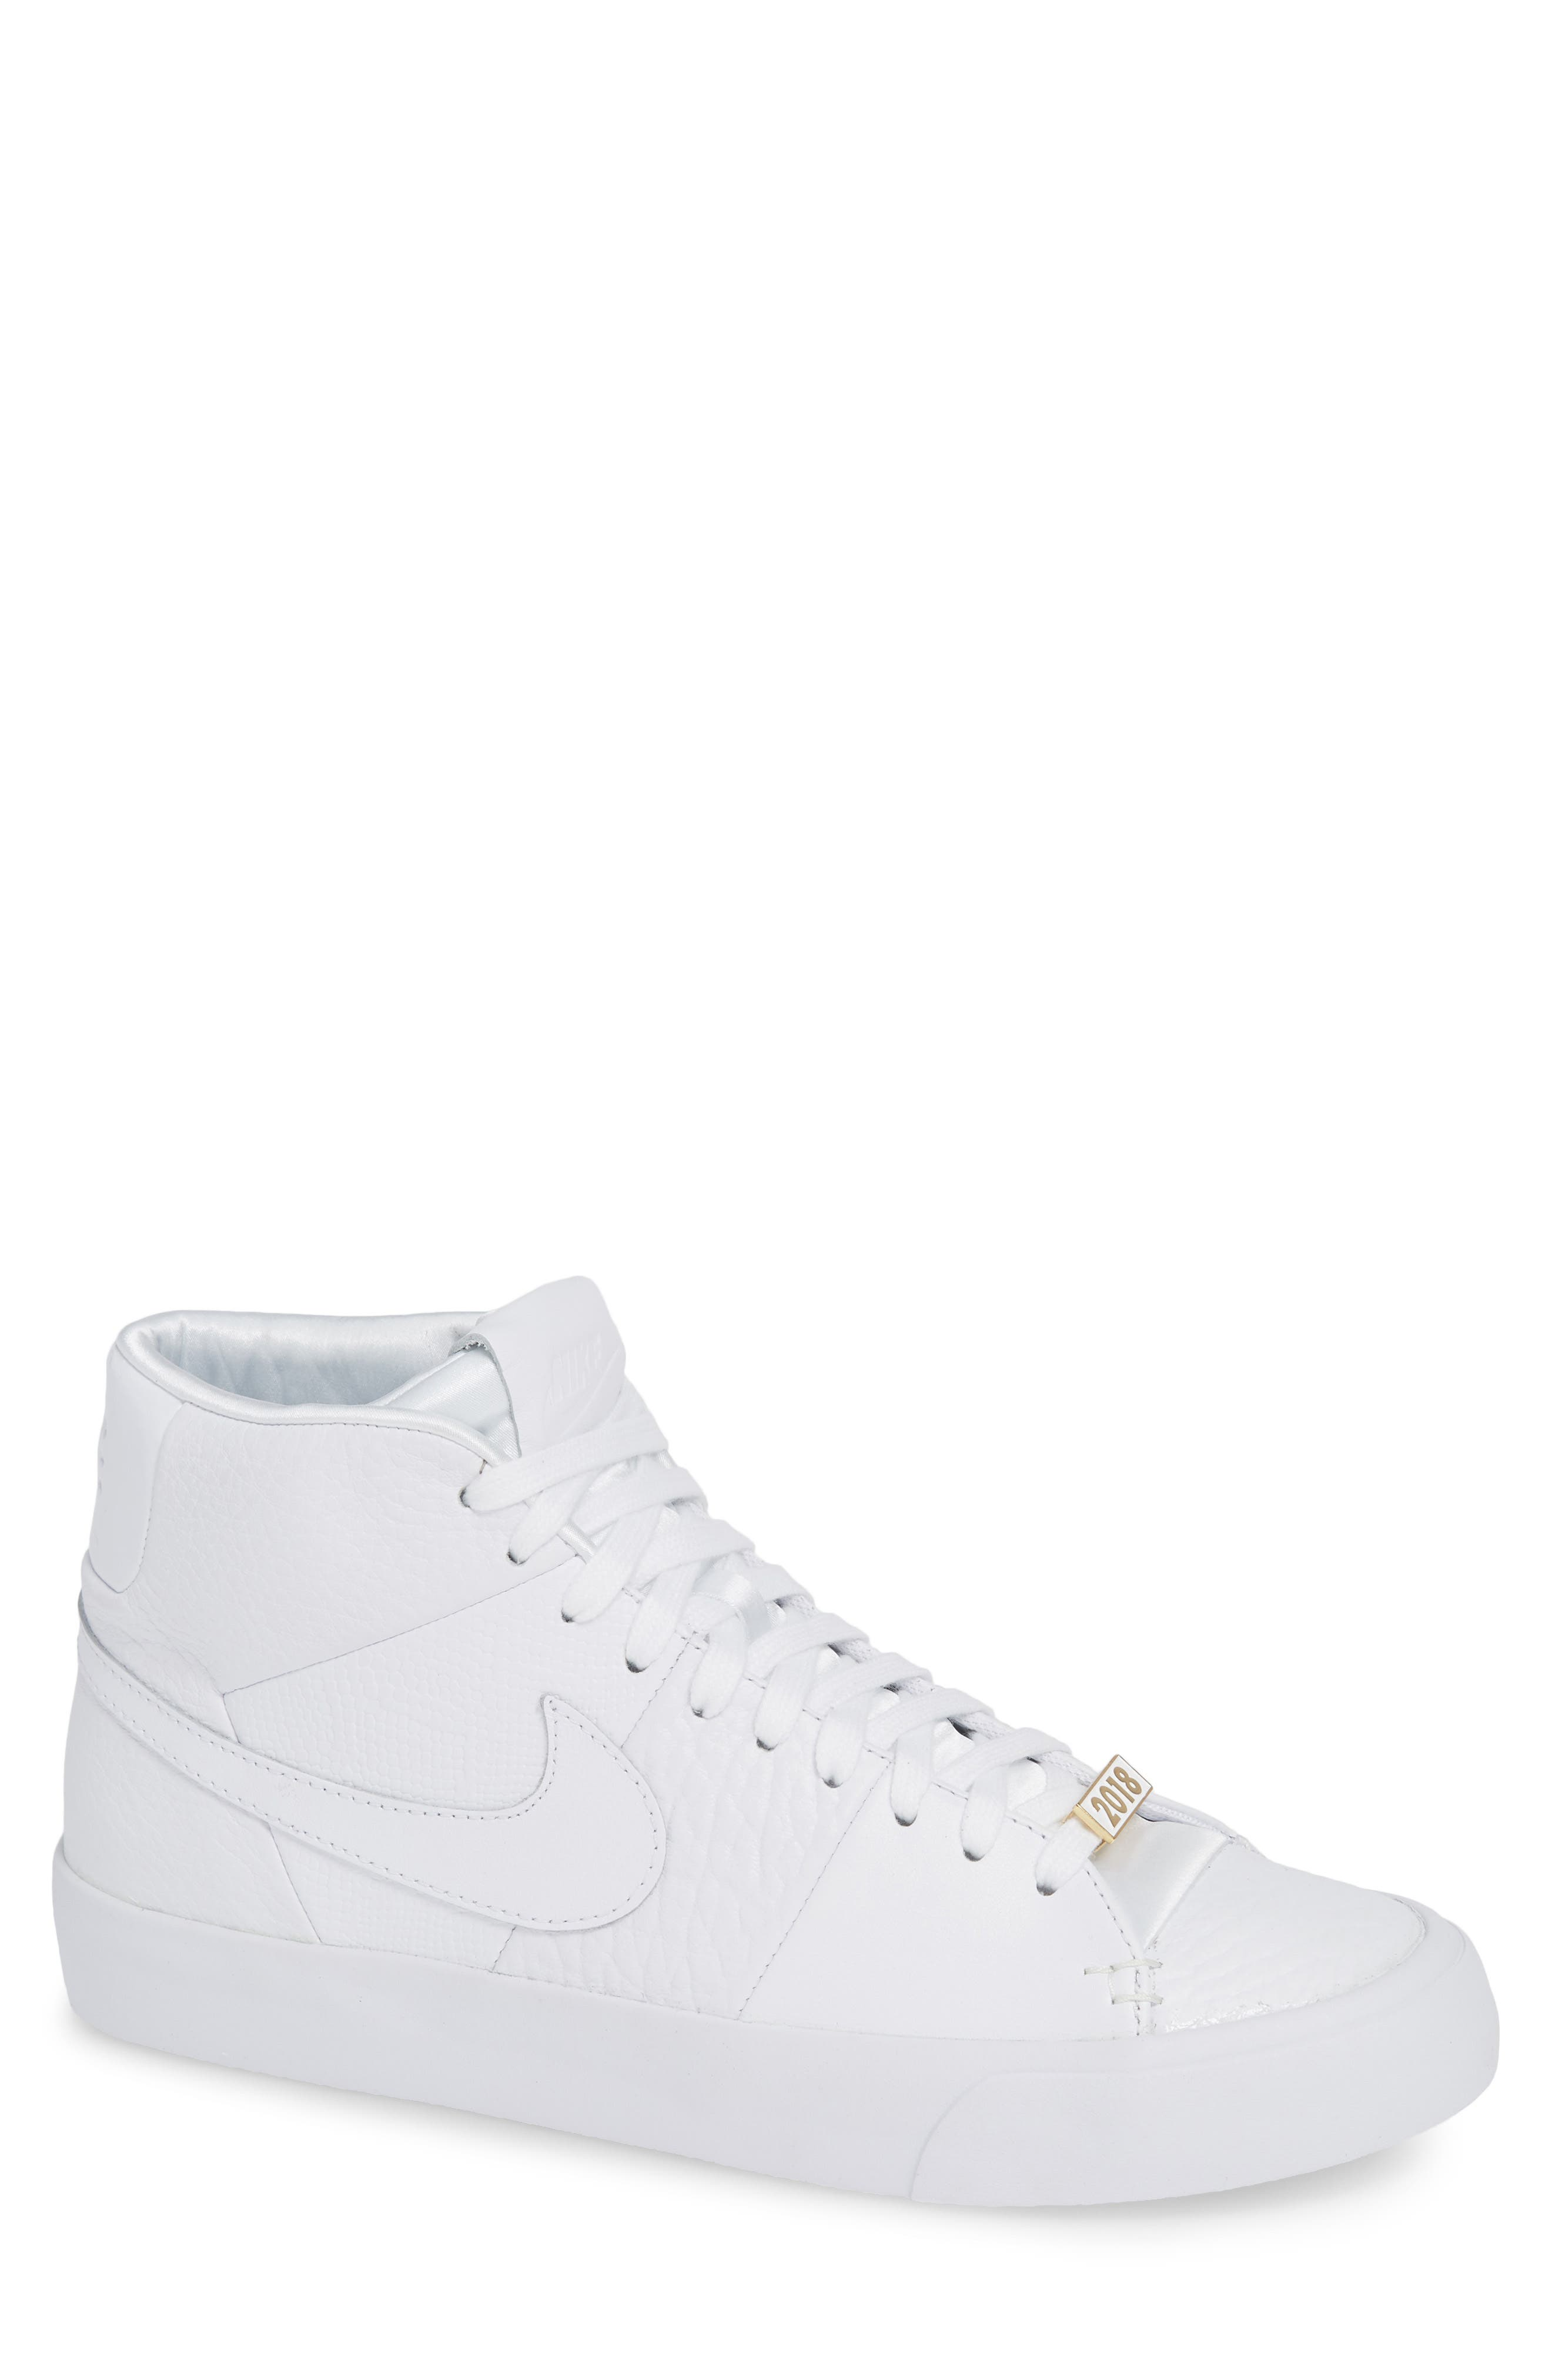 Blazer Royal QS High Top Sneaker,                             Main thumbnail 1, color,                             WHITE/ WHITE/ WHITE